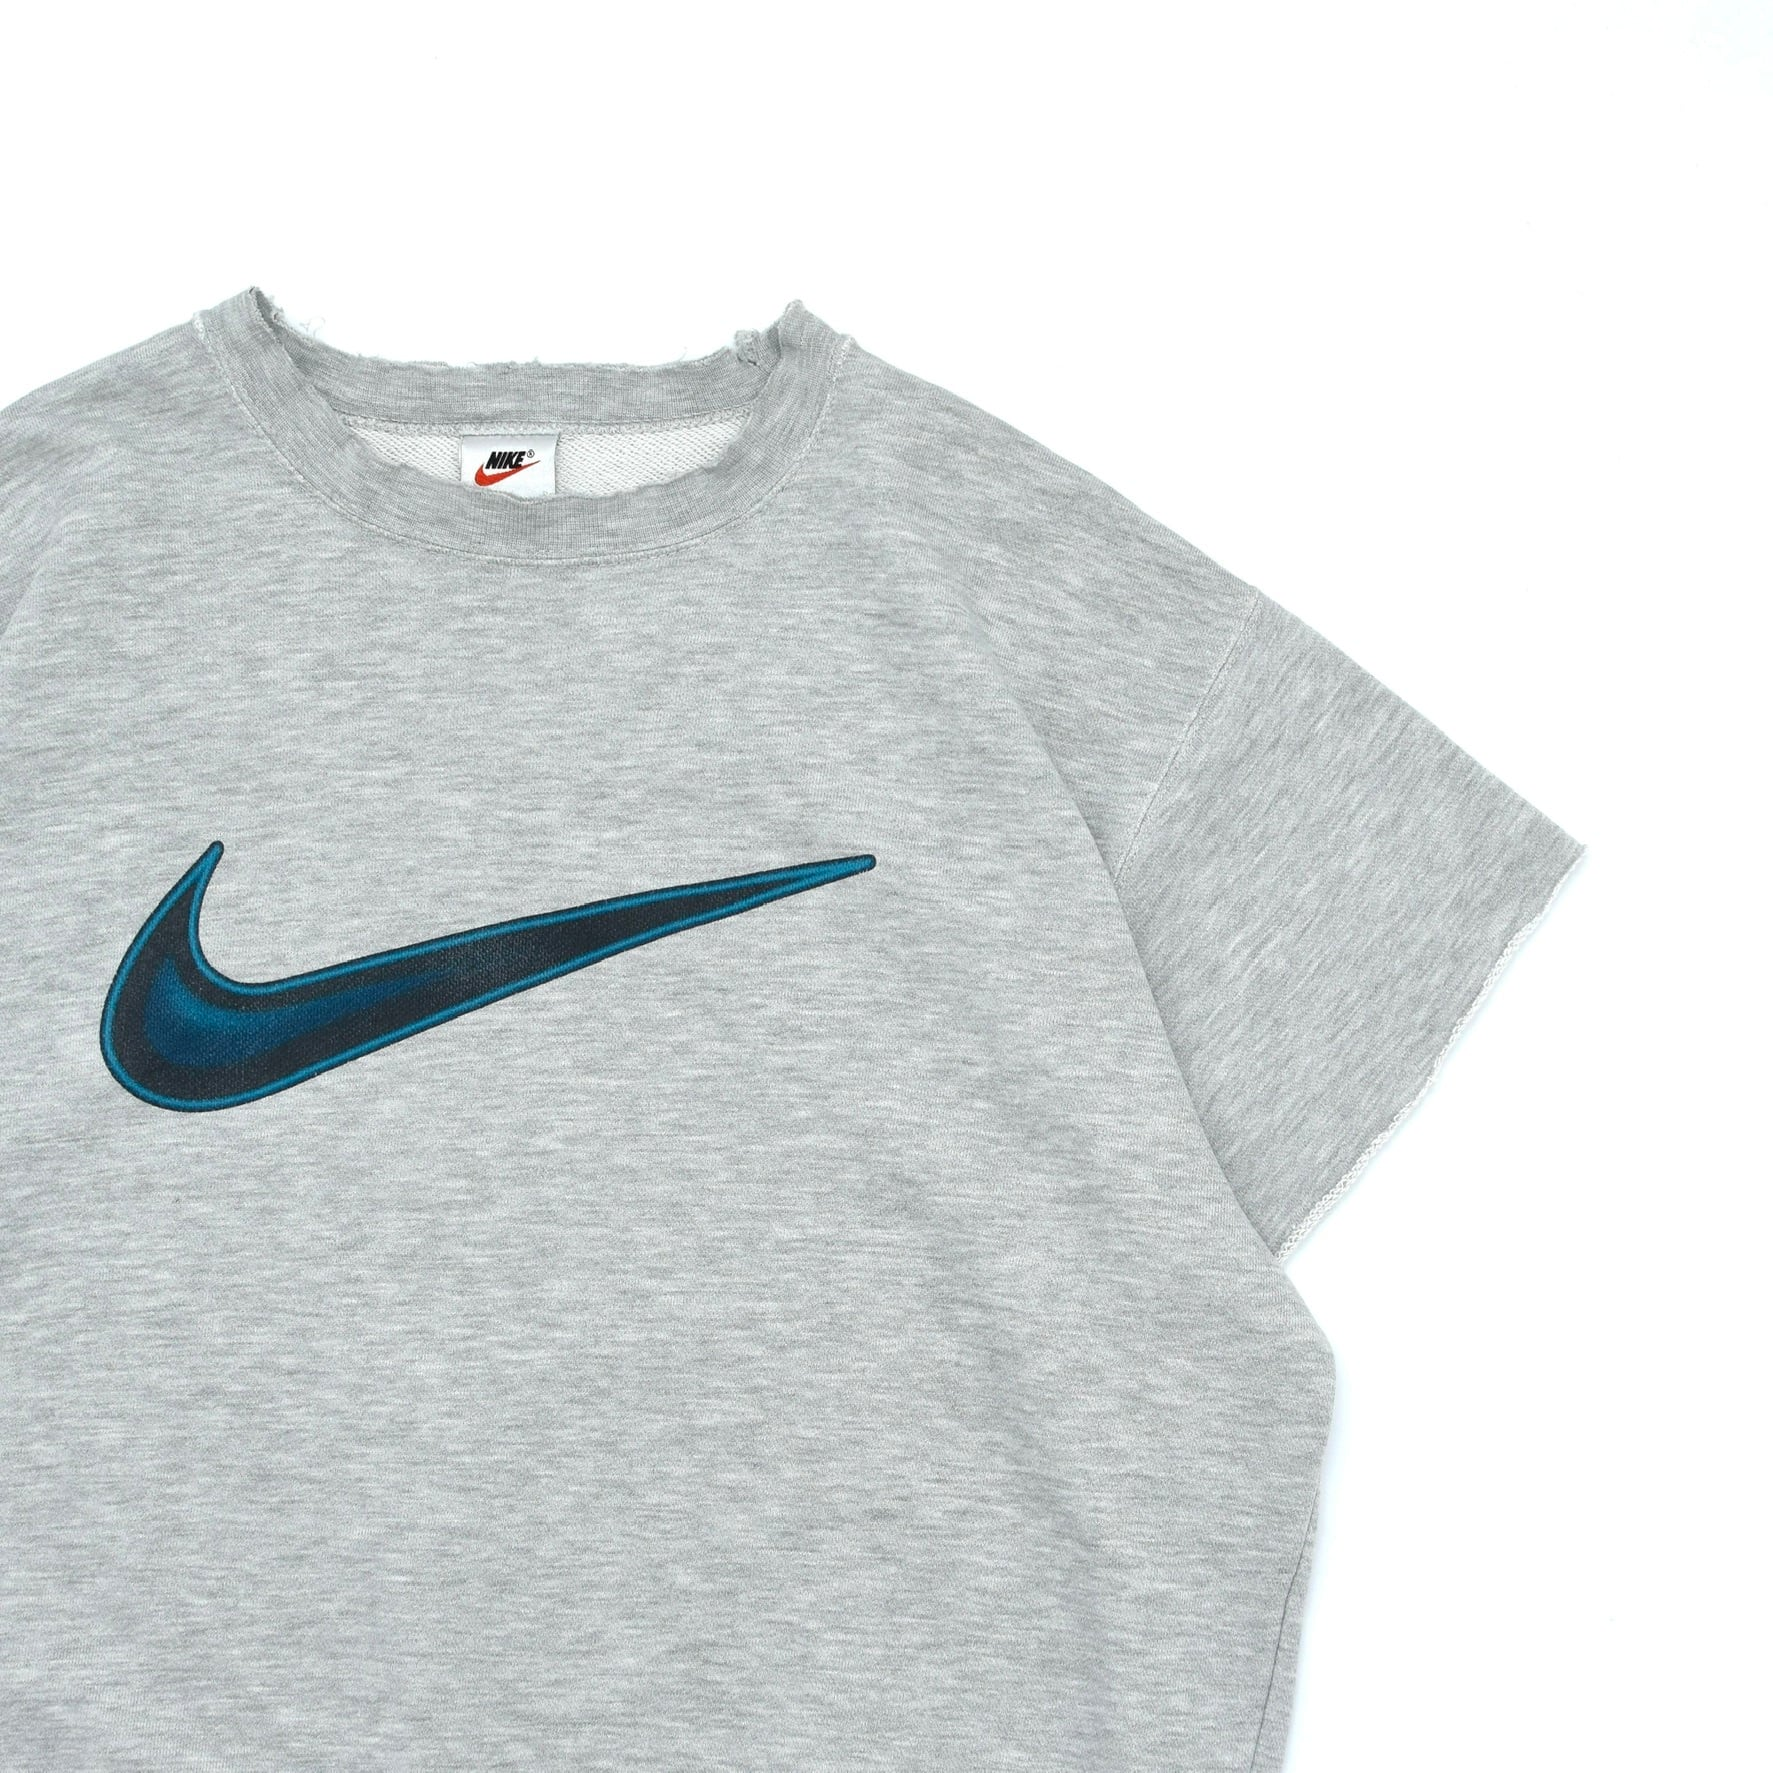 90's OLD NIKE cutoff sleeves sweatshirt